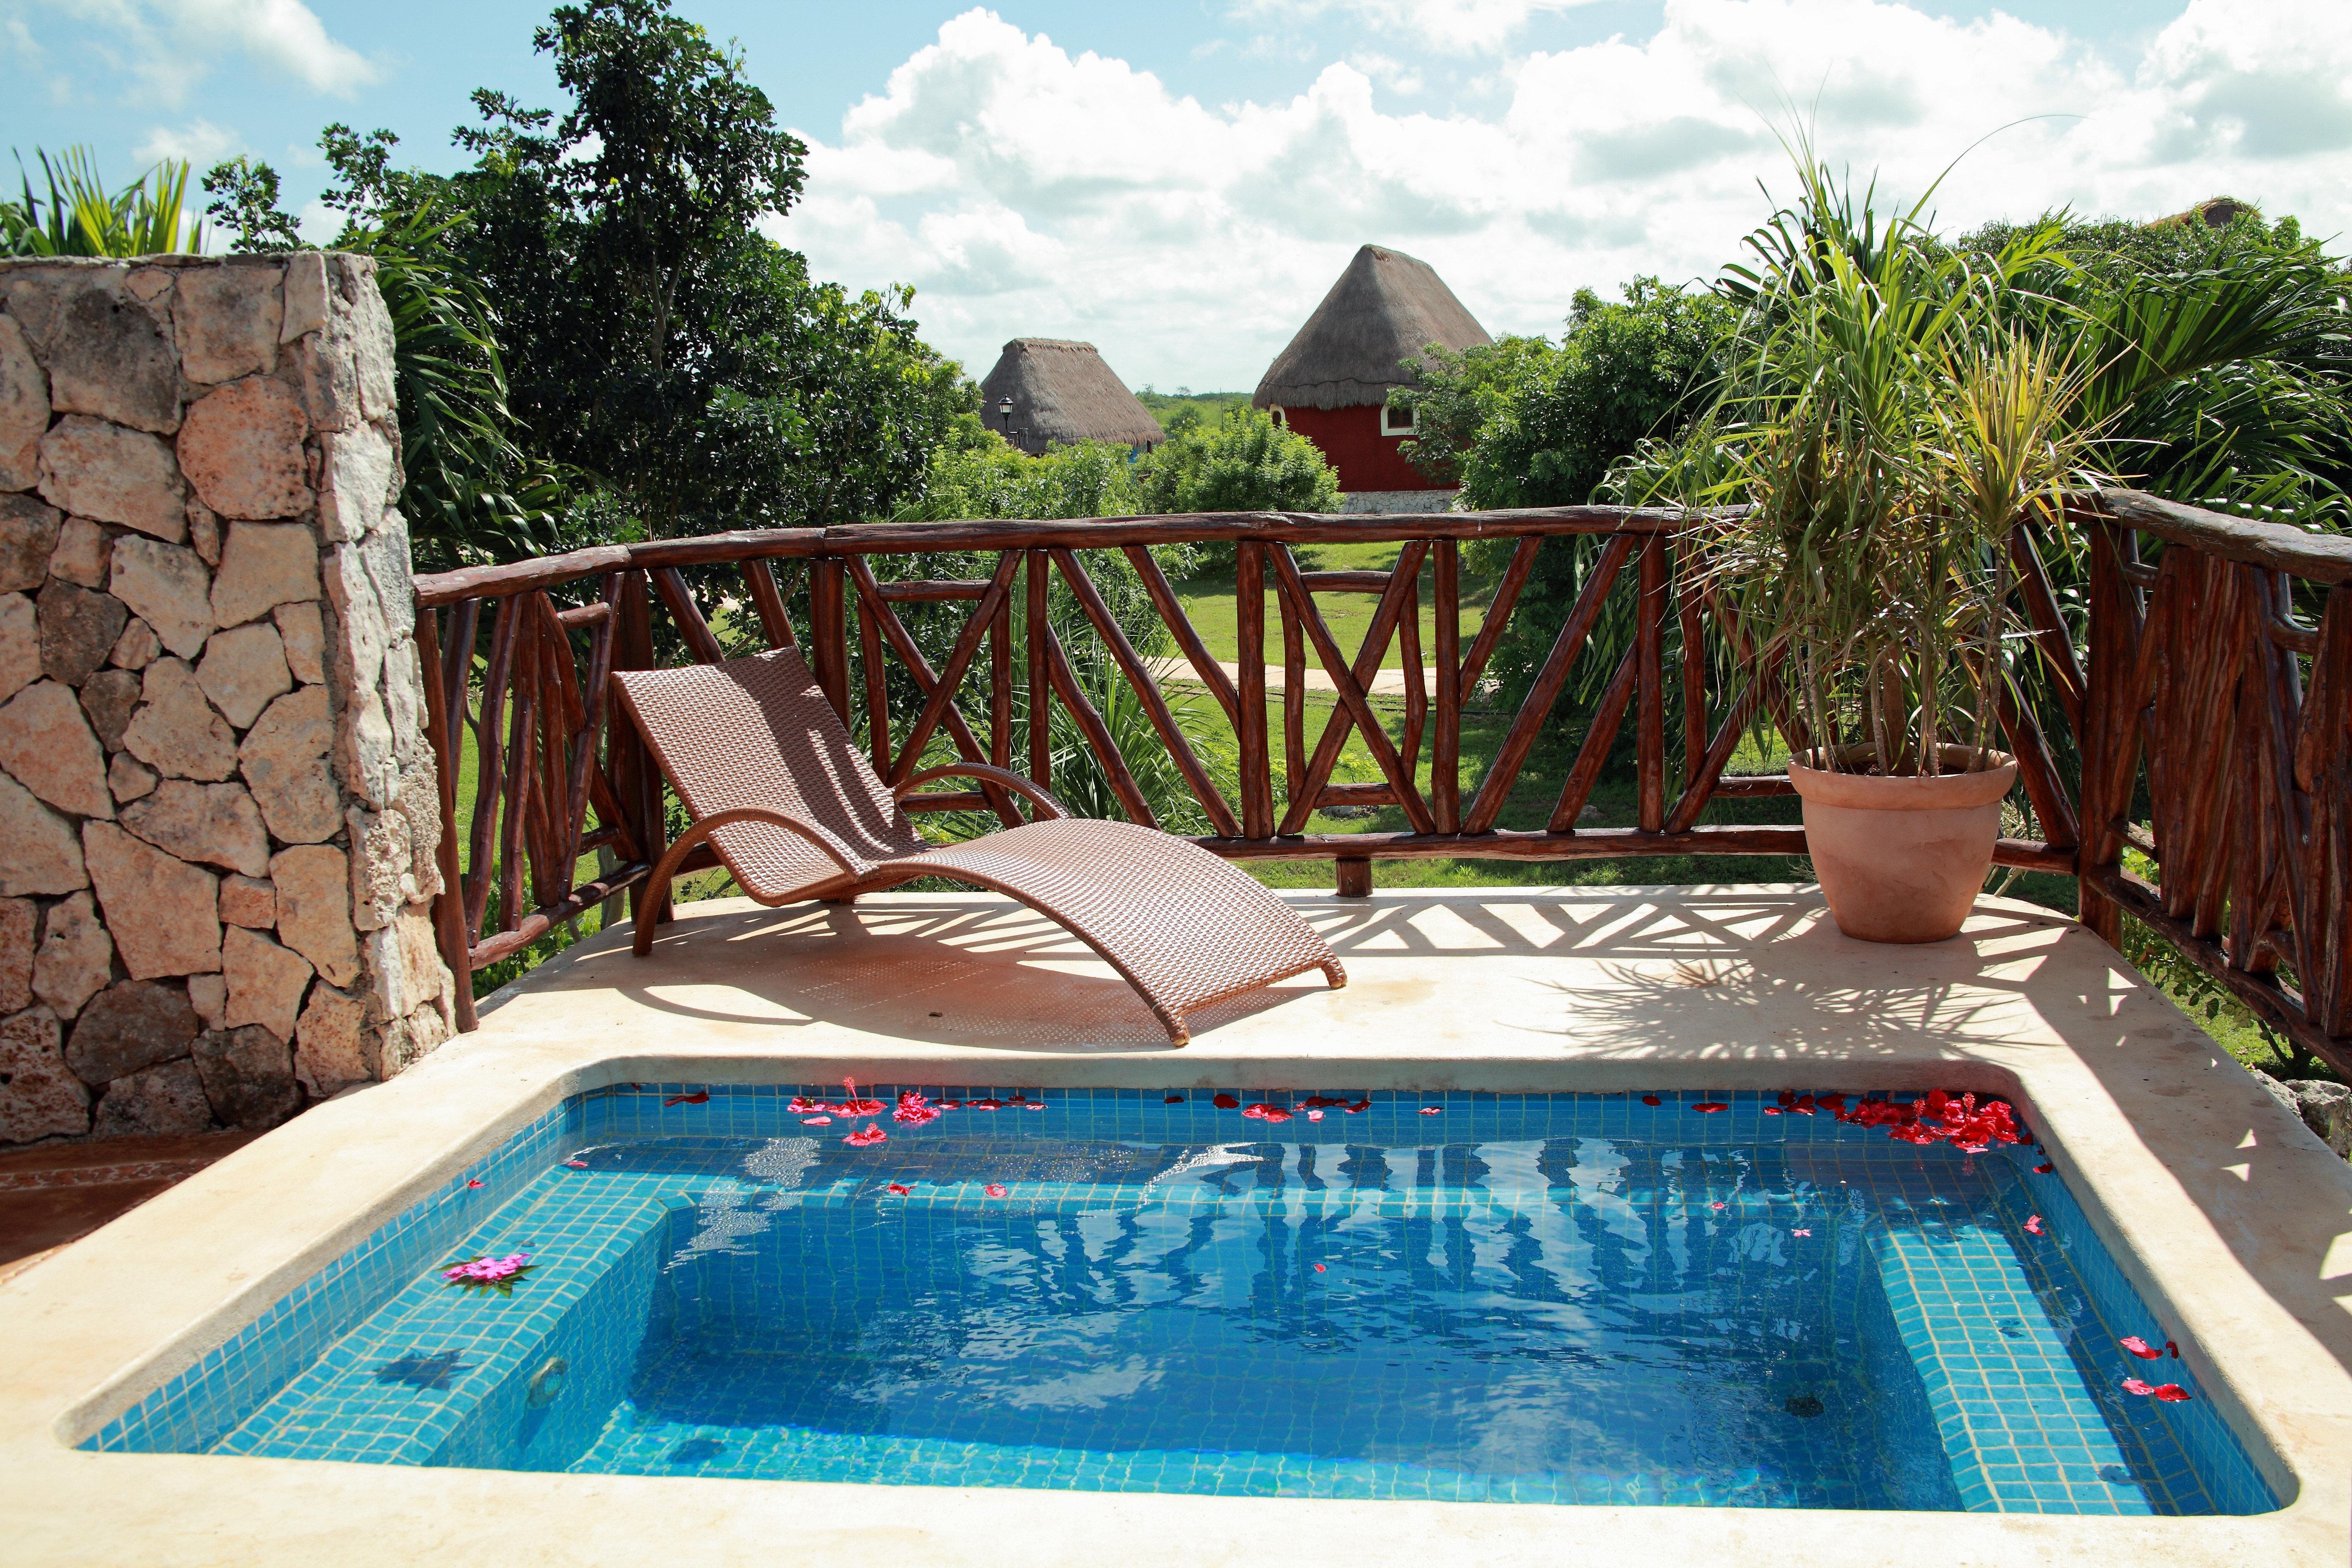 Drink Lounge Luxury Pool tree swimming pool property leisure backyard Villa Resort bathtub cottage jacuzzi